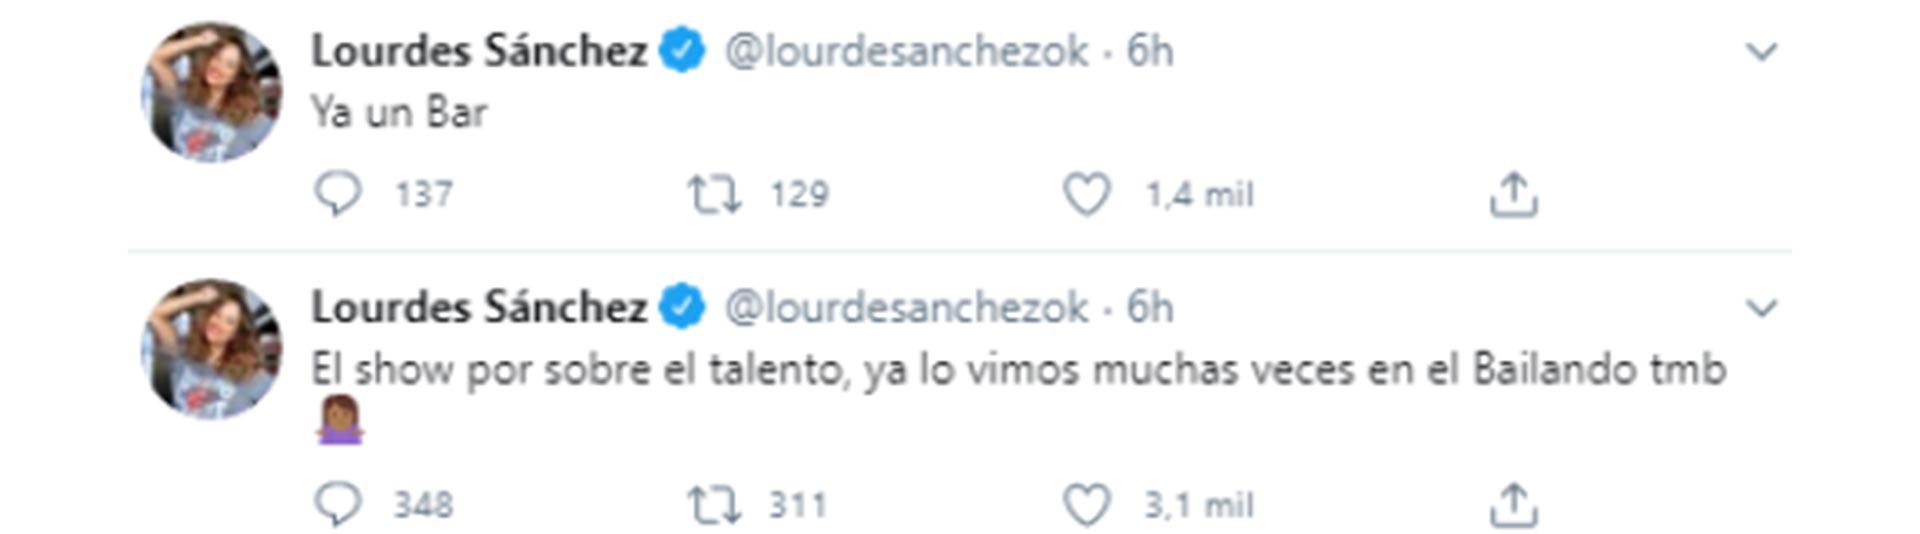 Lourdes Sánchez contra Esmeralda Mitre (Foto: Twitter)